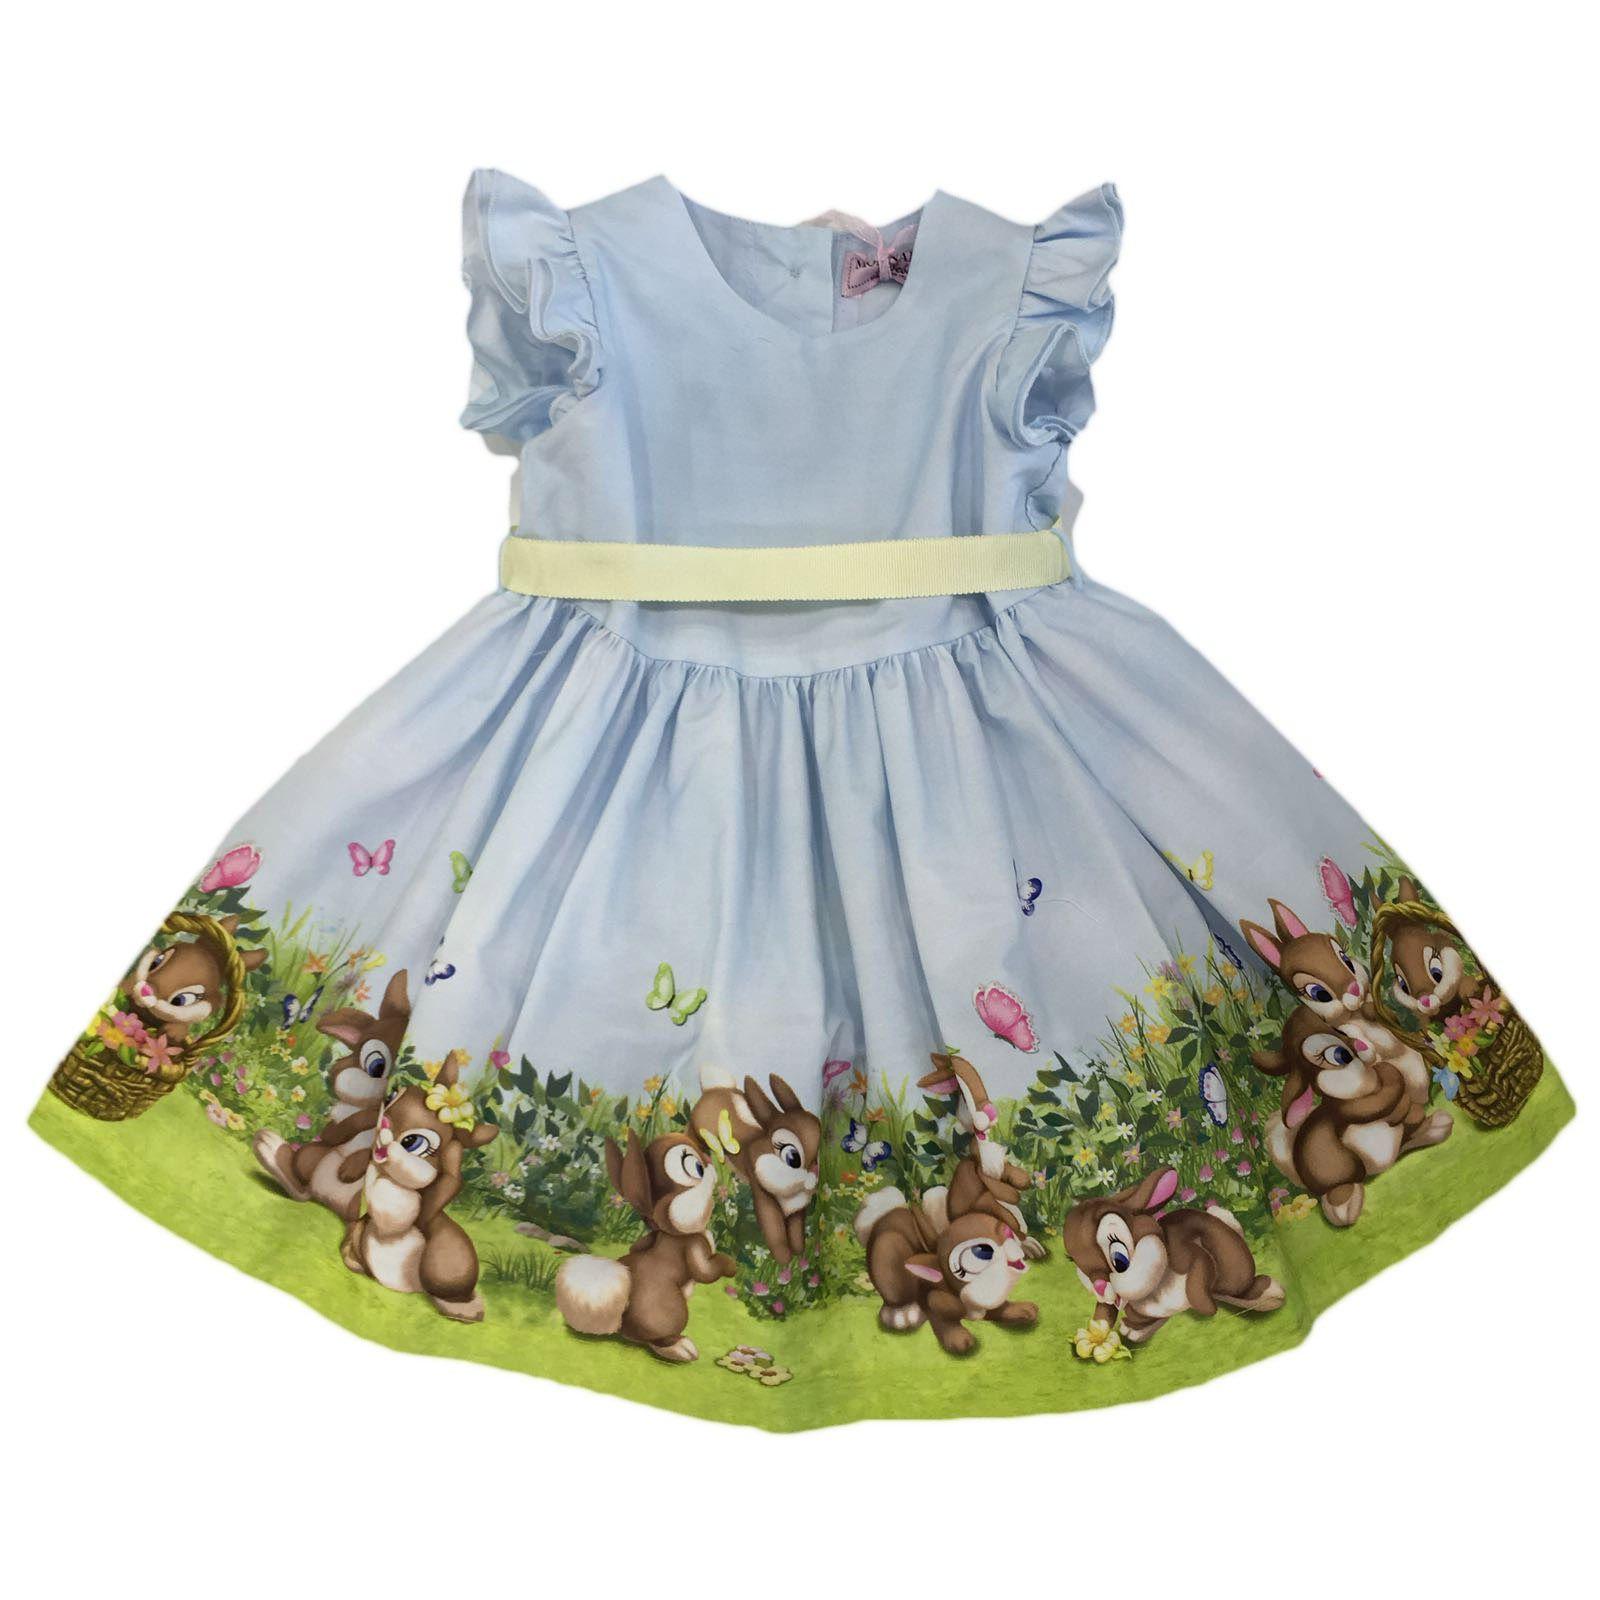 big sale 9e42d 25216 MONNALISA ABITO BUNNY | MONNALISA COLLECTION FOR KIDS ...